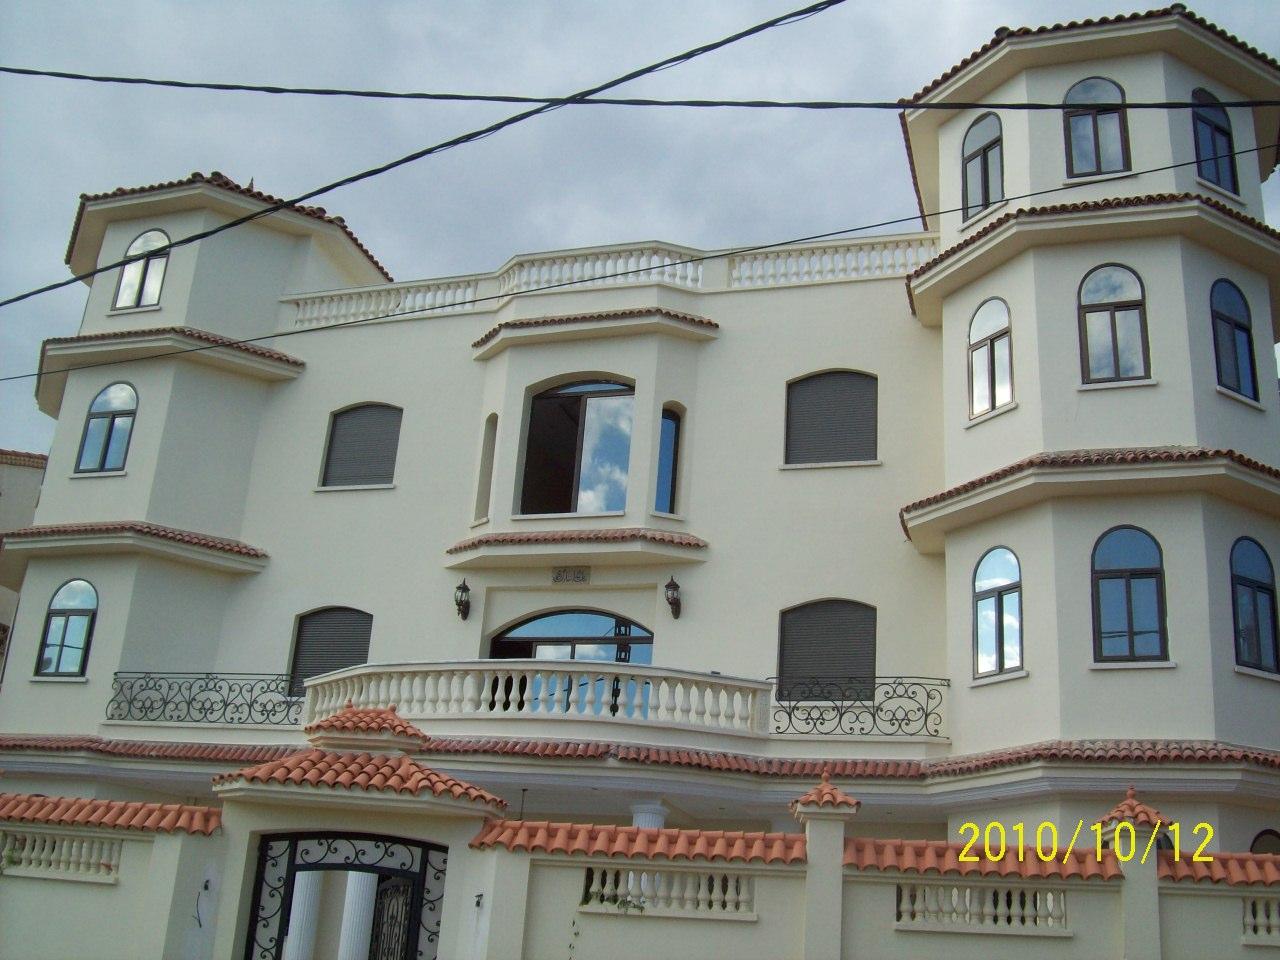 For Rent Villa Hydra Alger Algeria Hydra Algeria